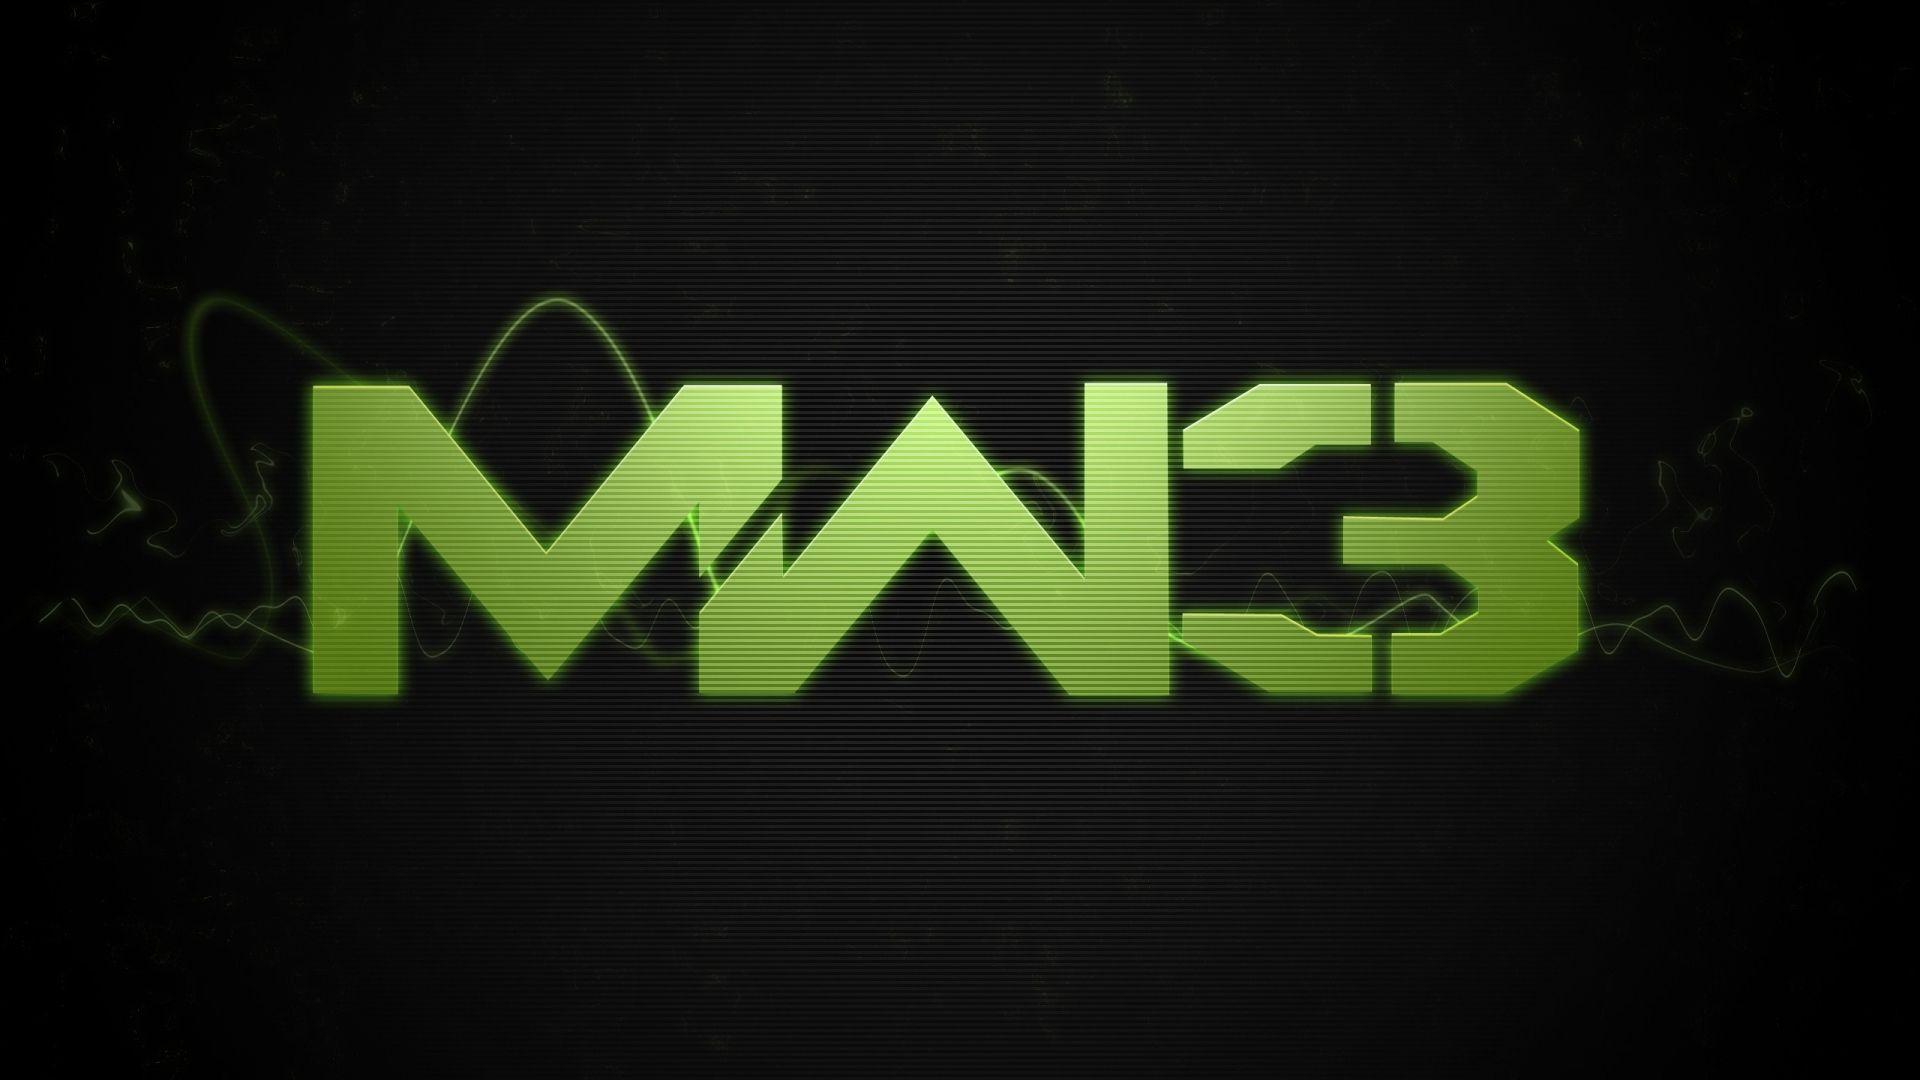 Call Of Duty Modern Warfare 3 Game Font Modern Warfare Call Of Duty Call Of Duty Black